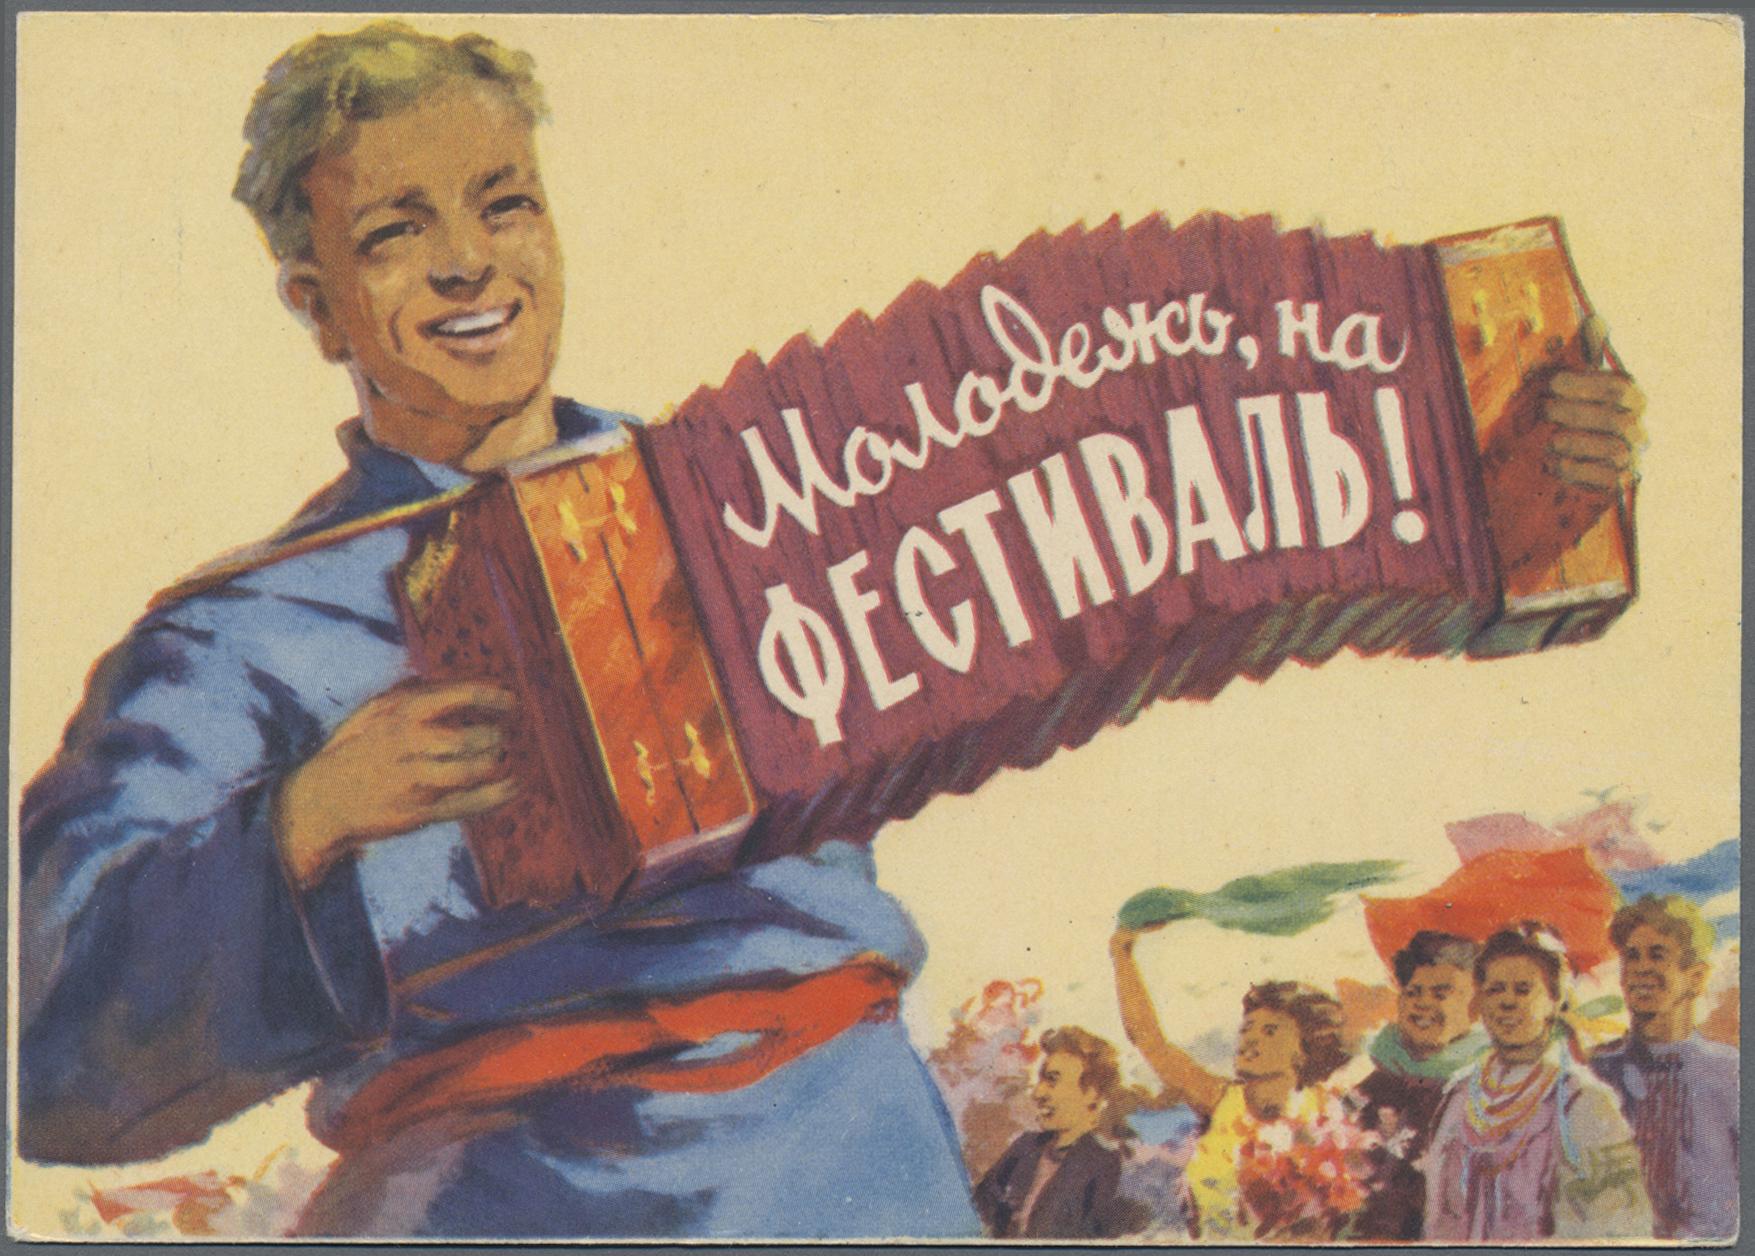 Lot 03998 - ansichtskarten: politik / politics  -  Auktionshaus Christoph Gärtner GmbH & Co. KG Special auction